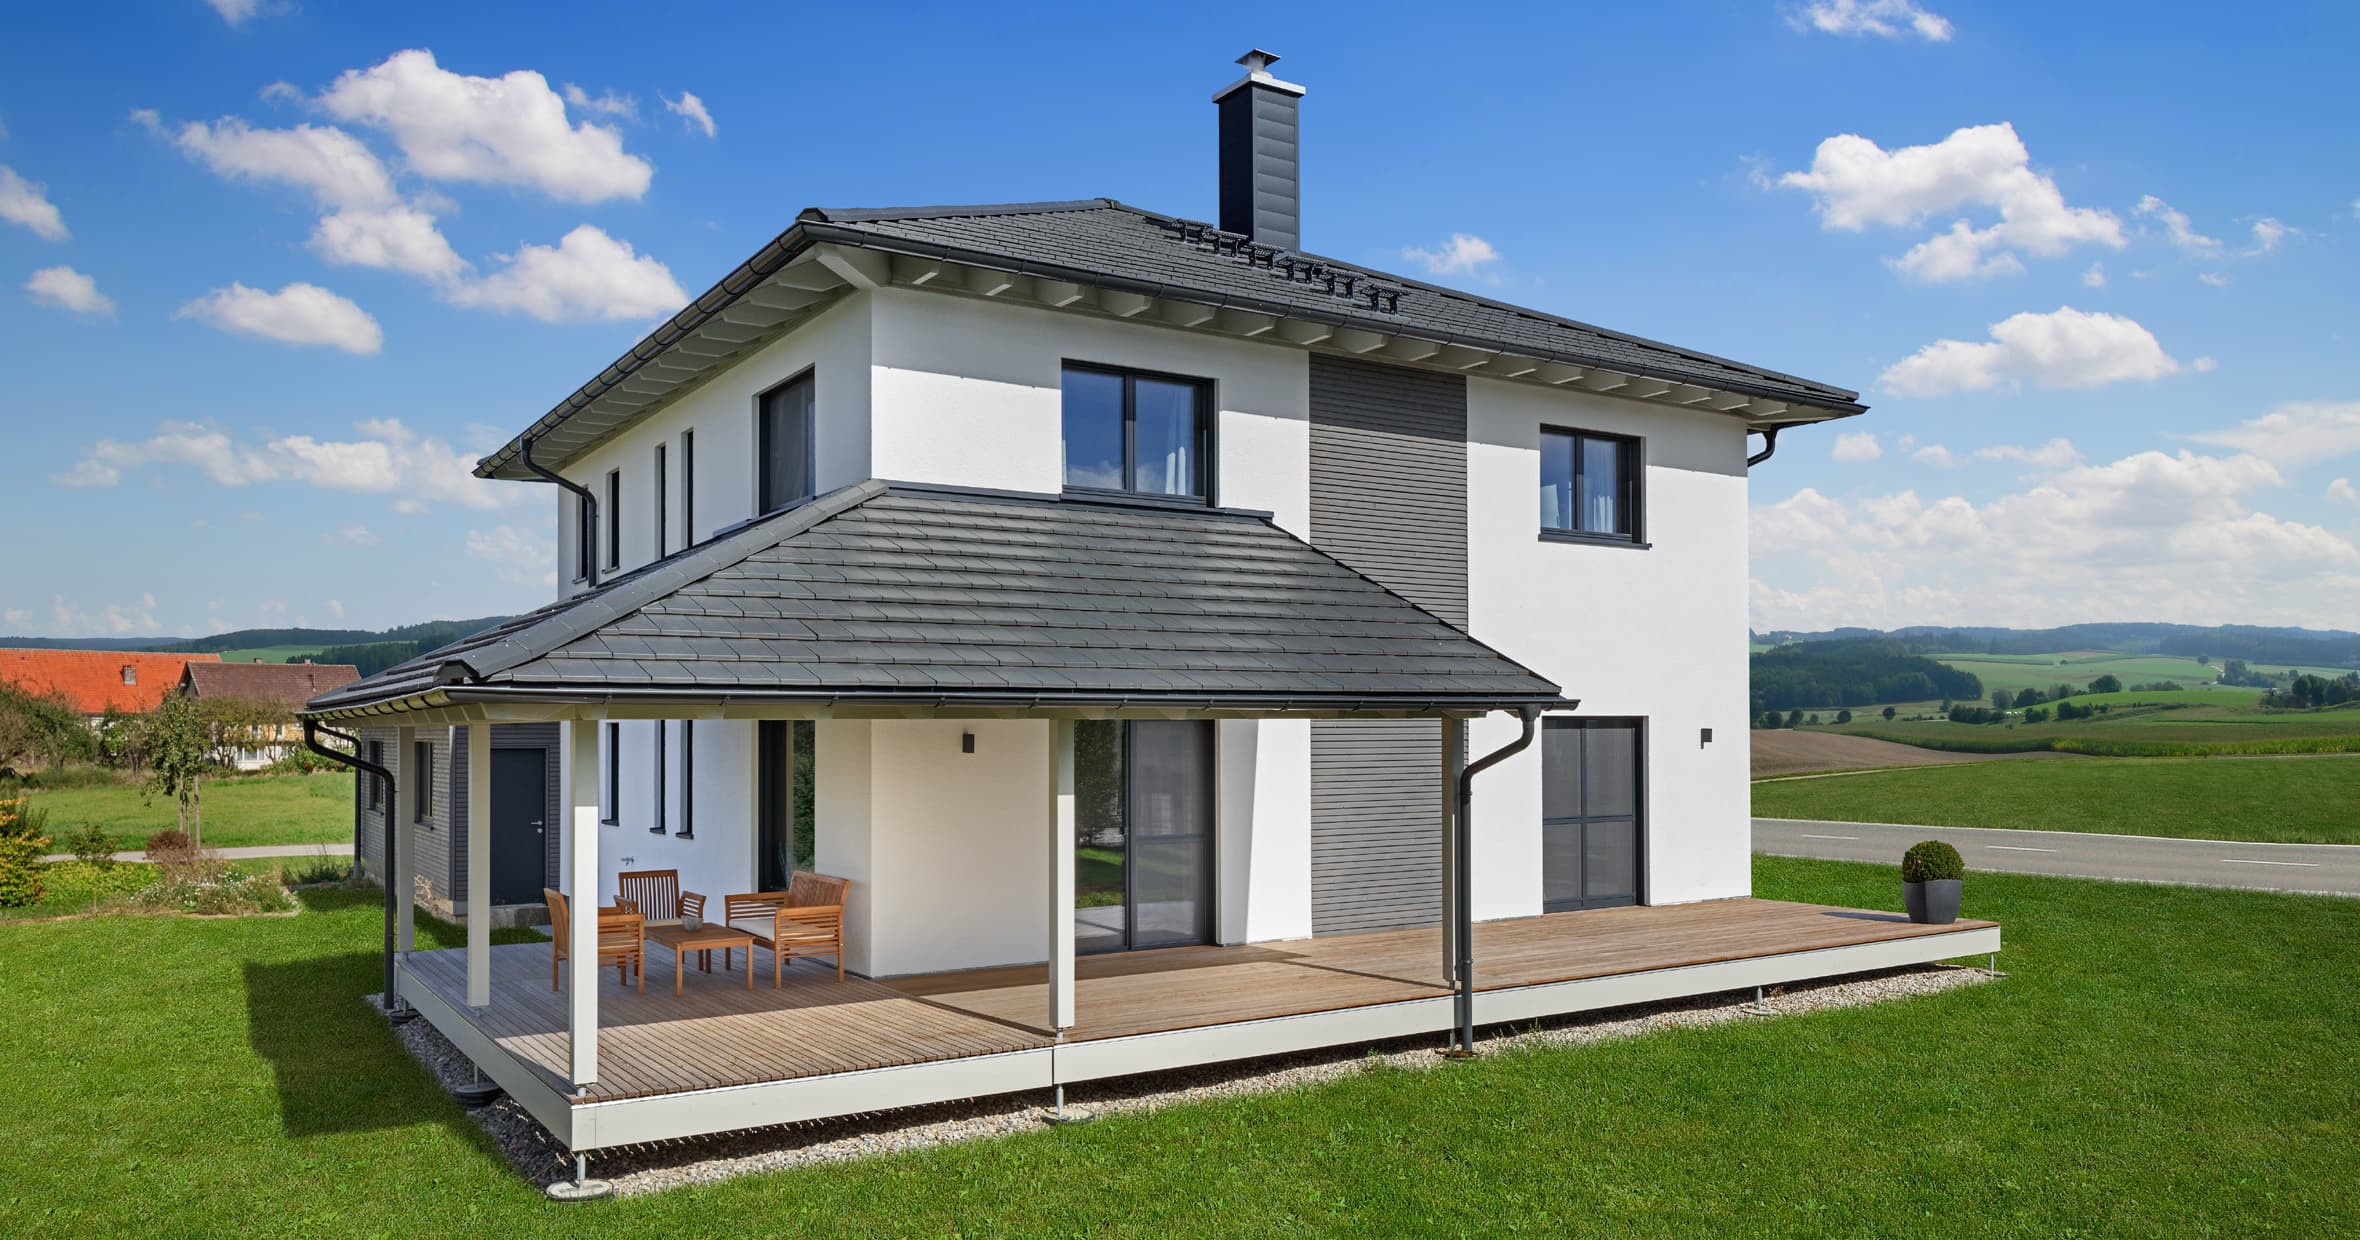 Stadthaus bongart bau fritz gmbh co kg anbieter - Dachformen architektur ...